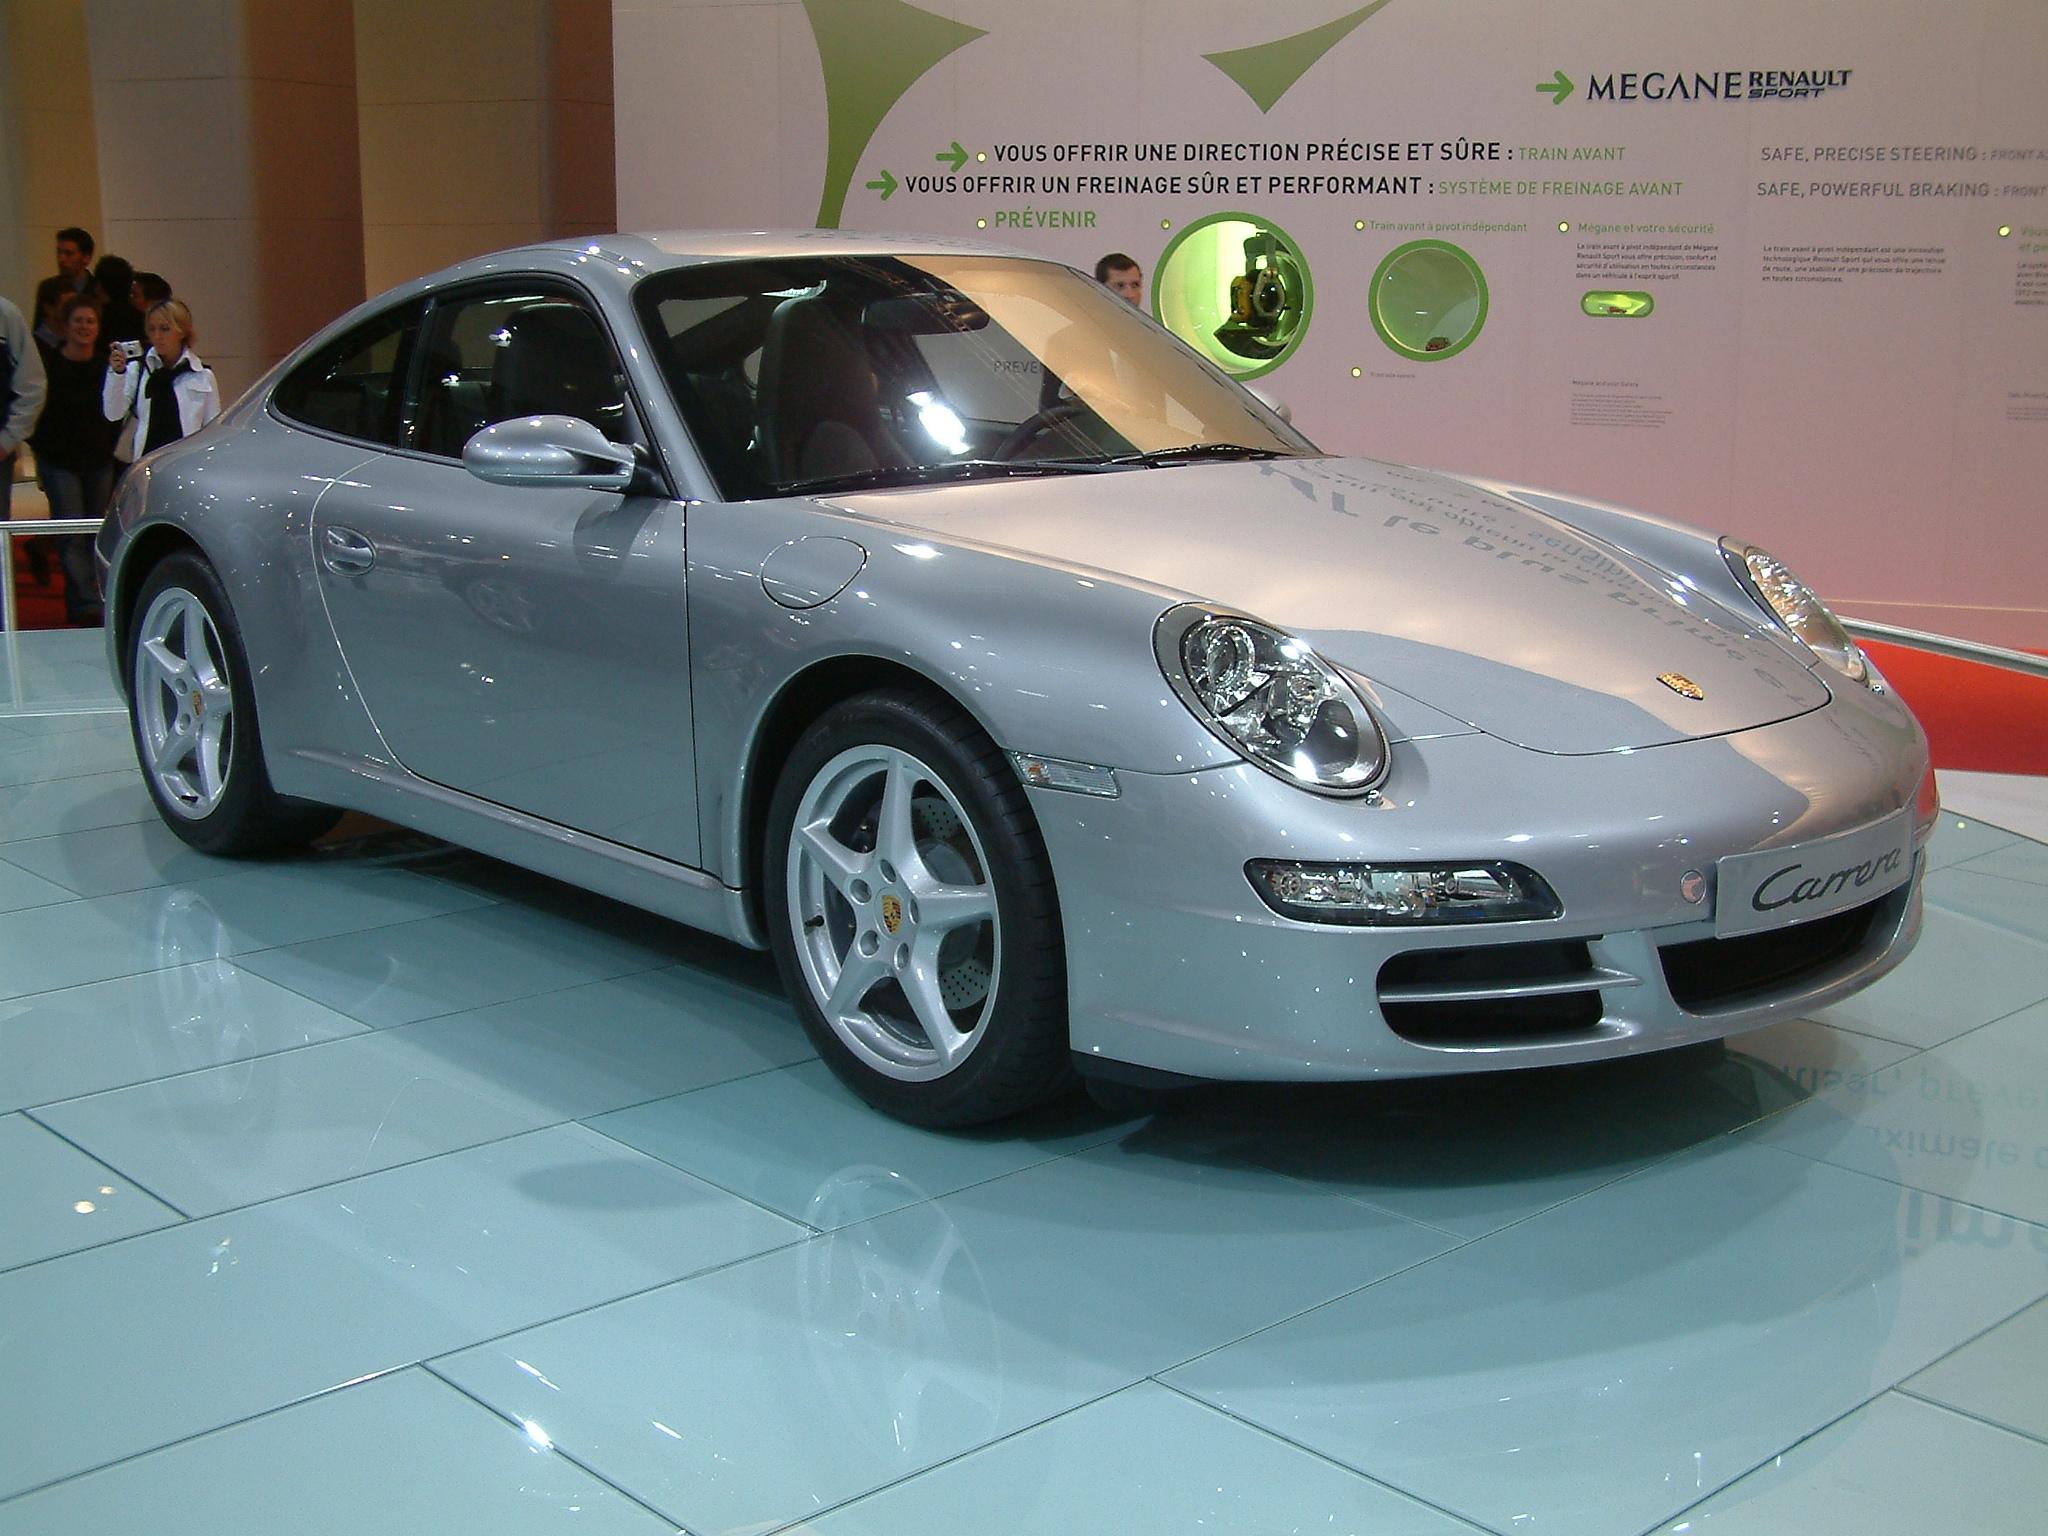 file 2004 silver porsche 911 carrera type. Black Bedroom Furniture Sets. Home Design Ideas